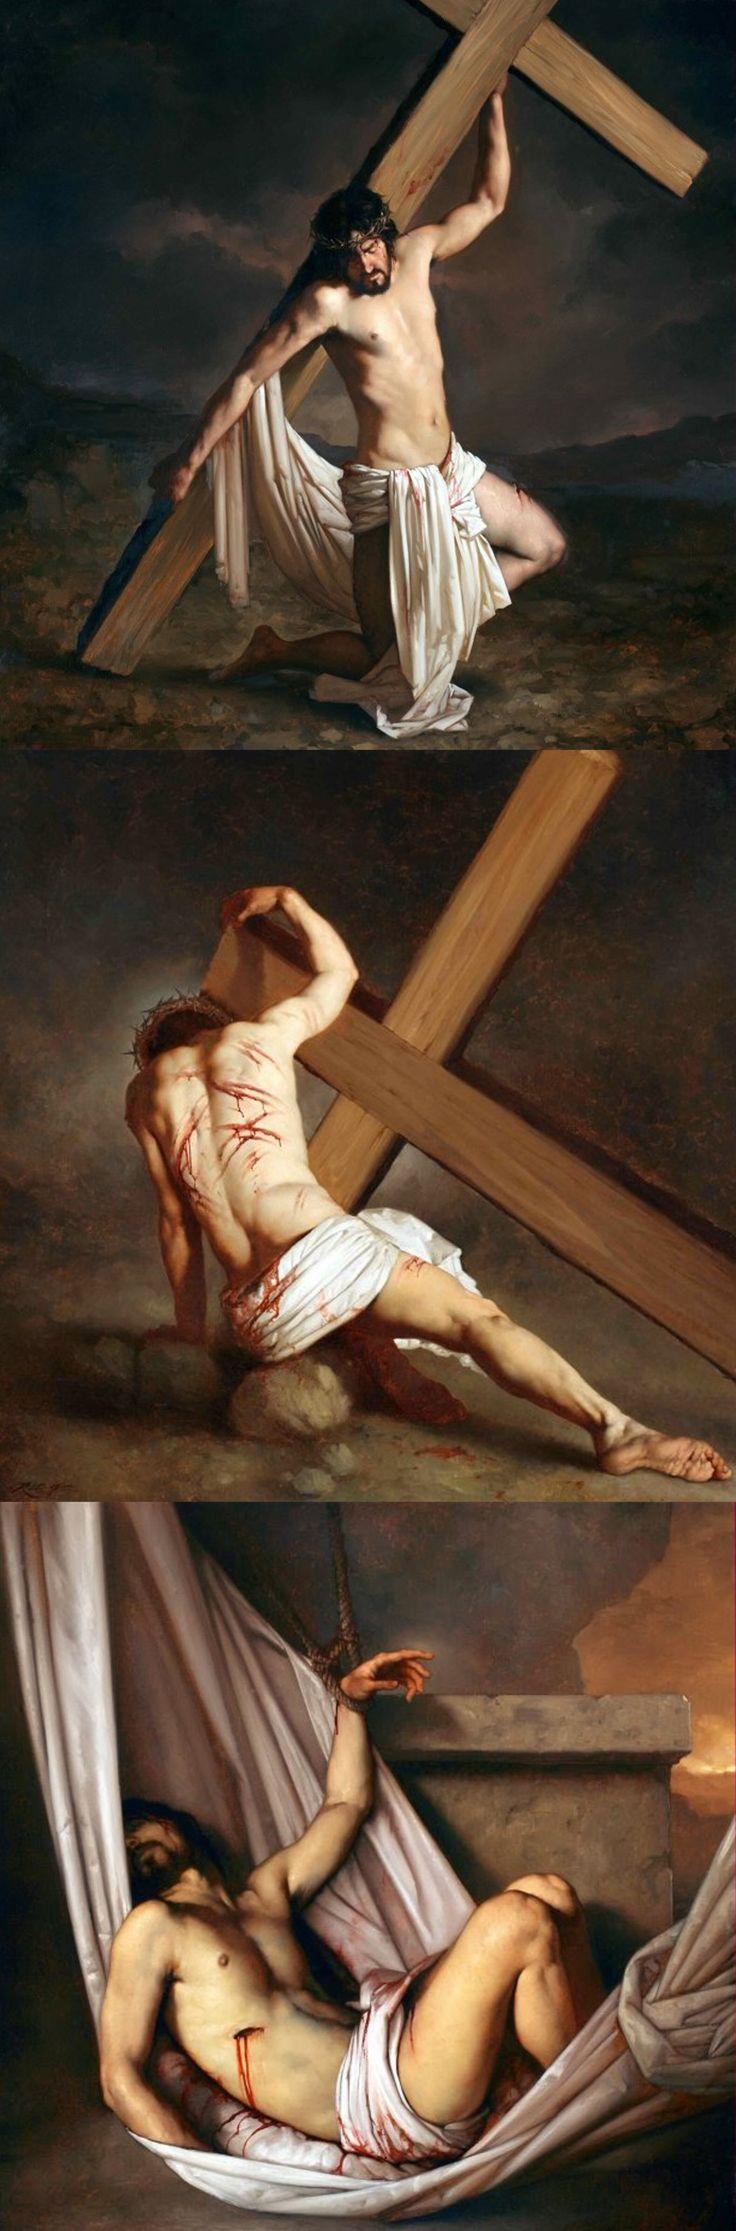 "Roberto Ferri, ""Via Crucis"" (Stations of the Cross)"